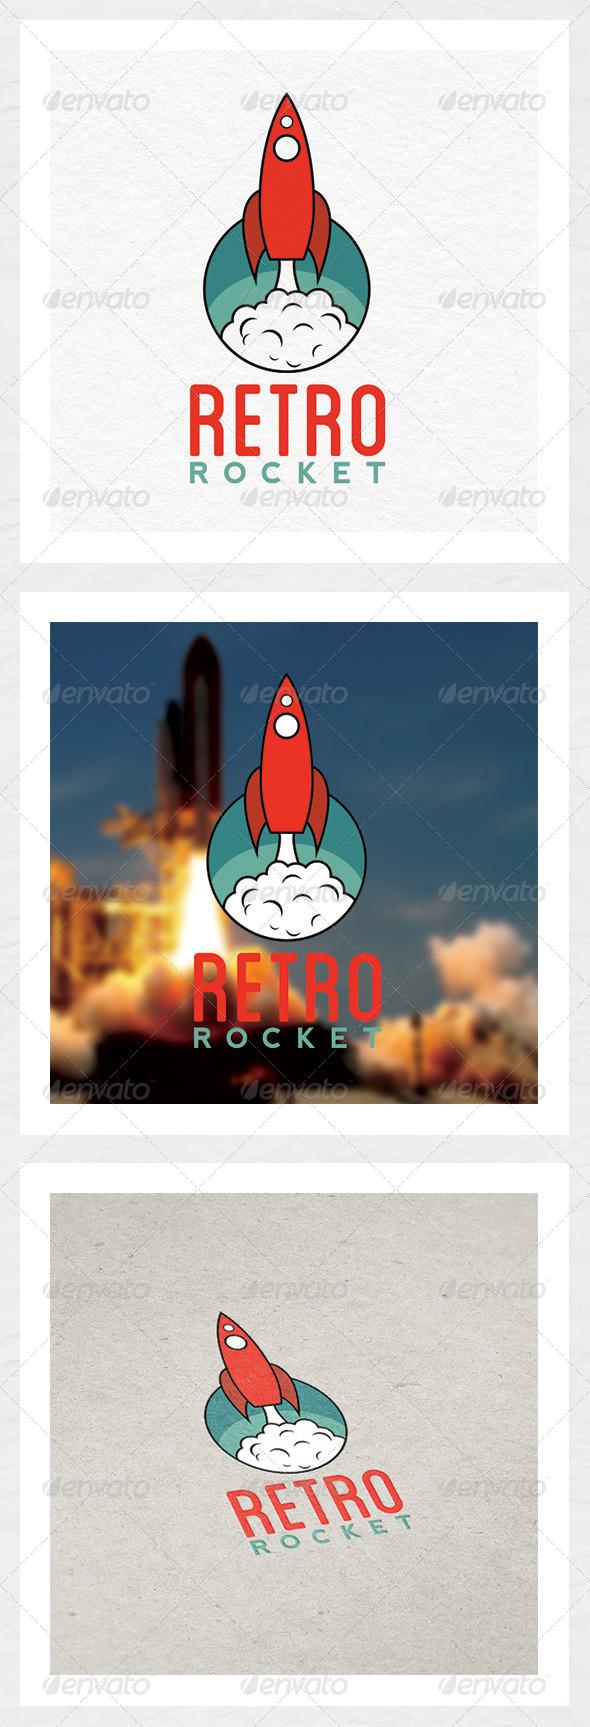 GraphicRiver Retro Rocket 7551797